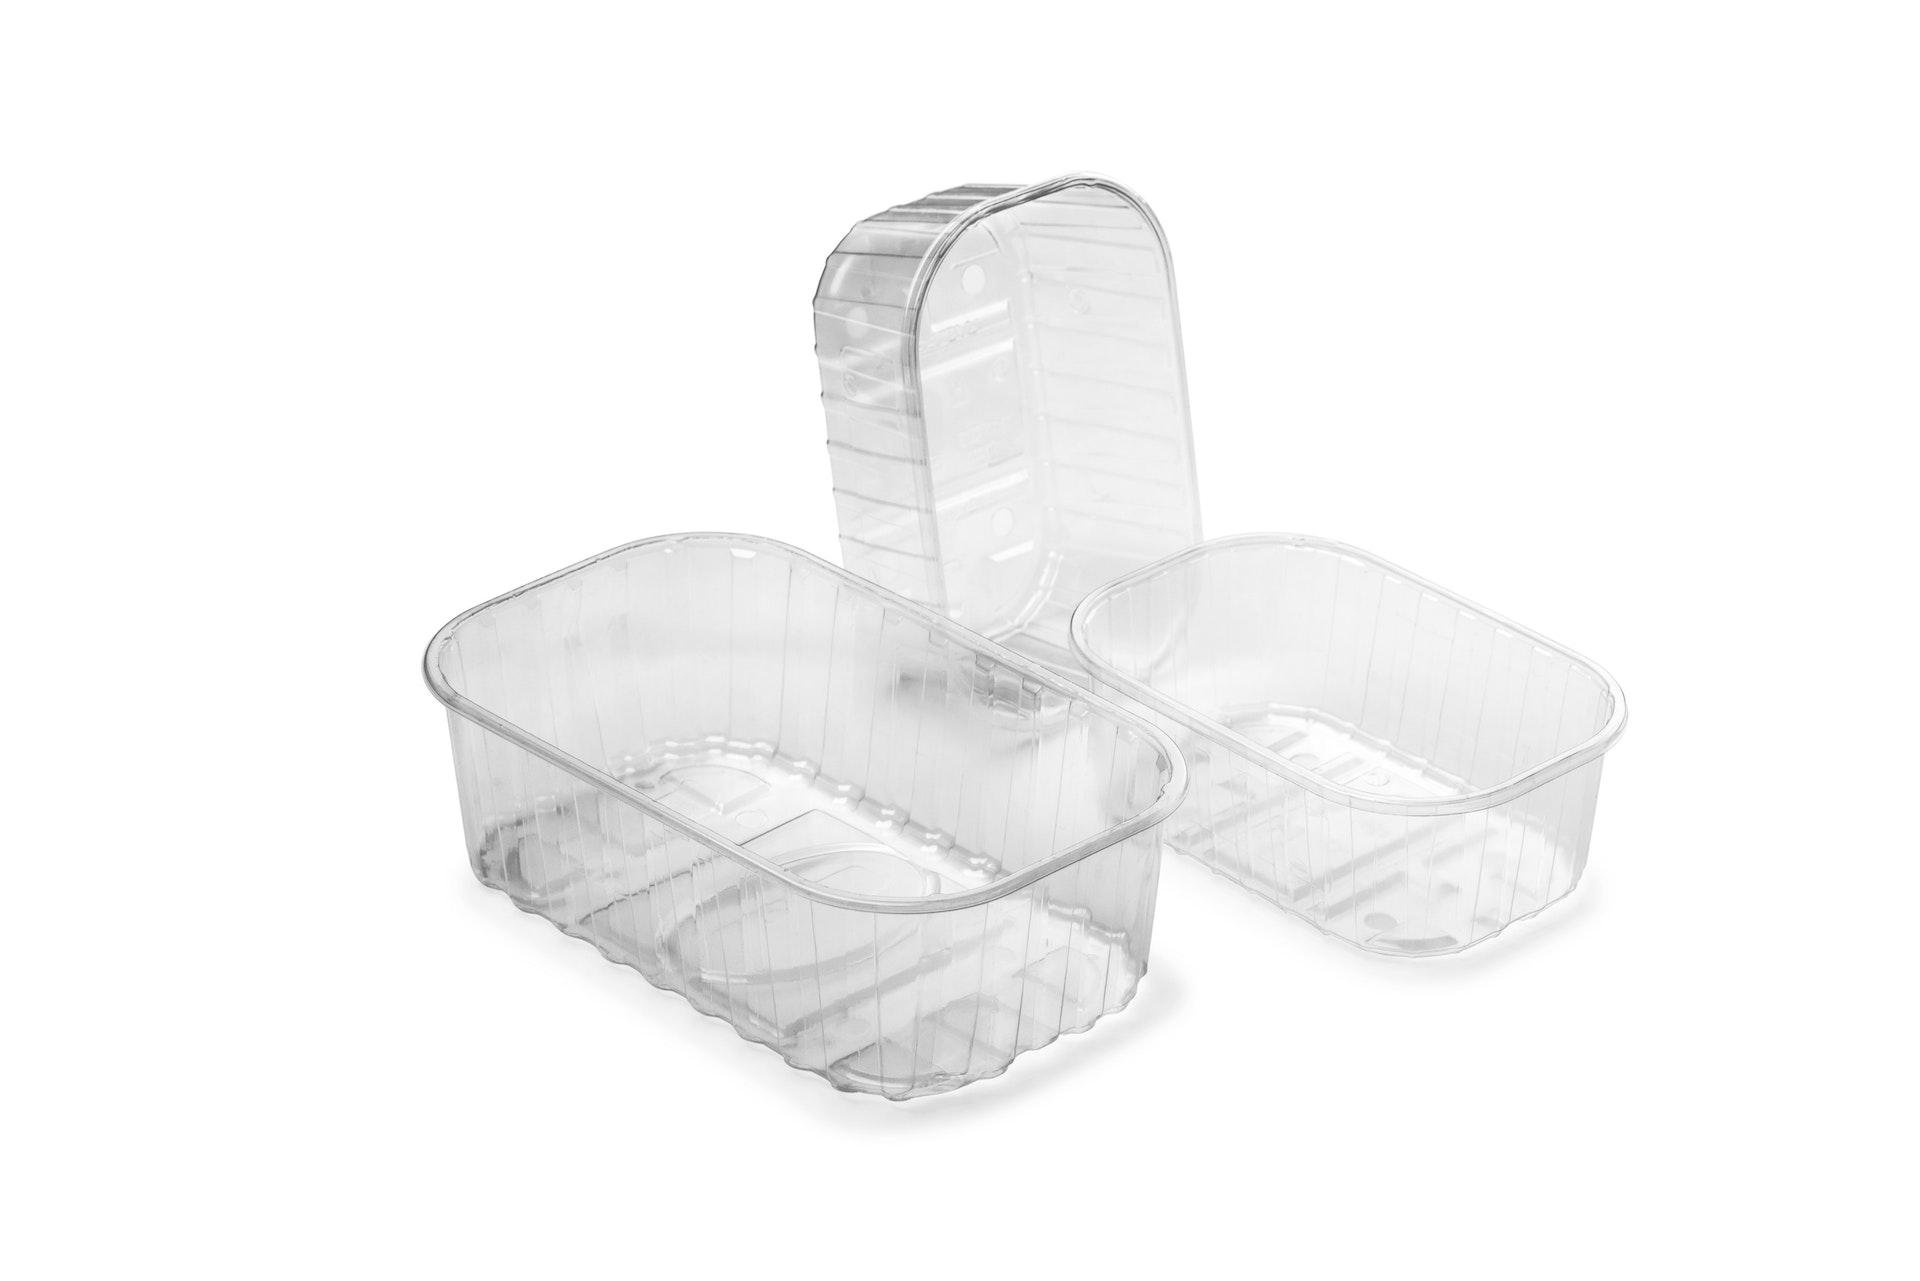 Thermal Lamination trays